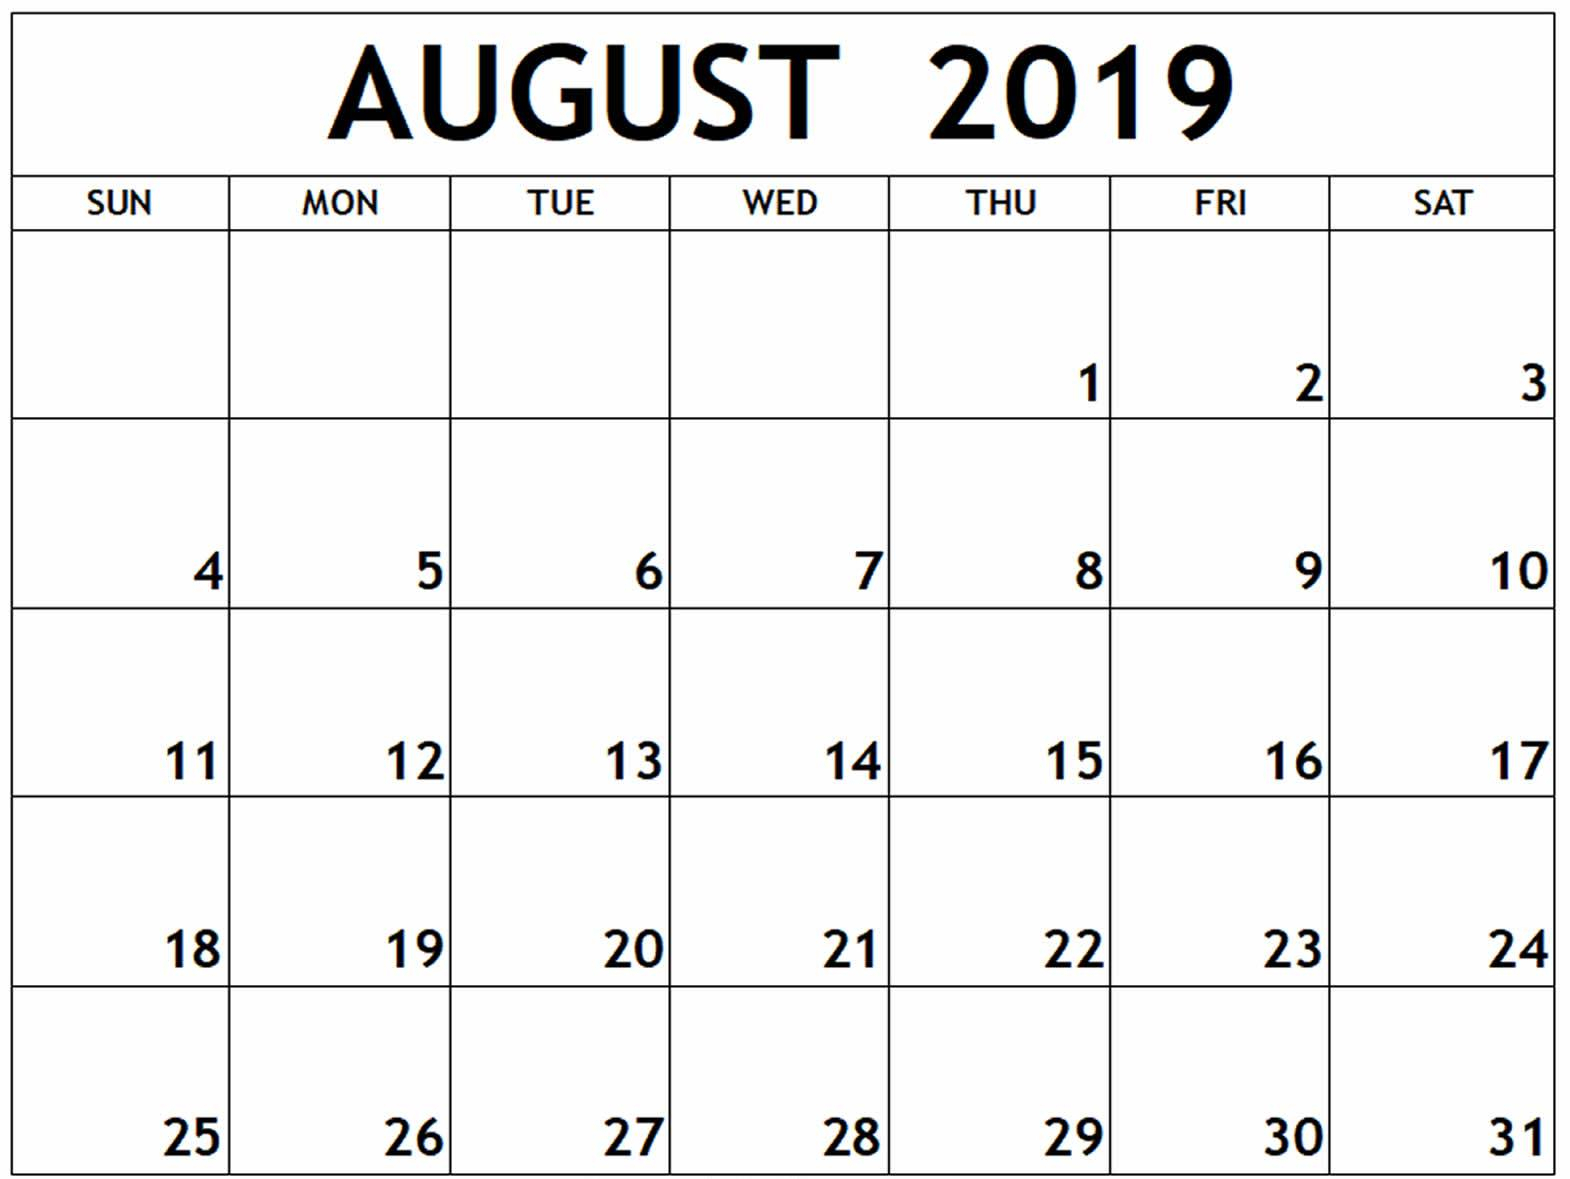 August 2019 Calendar Printable - Free August 2019 Calendar Printable with regard to Printable Blank Calendar August